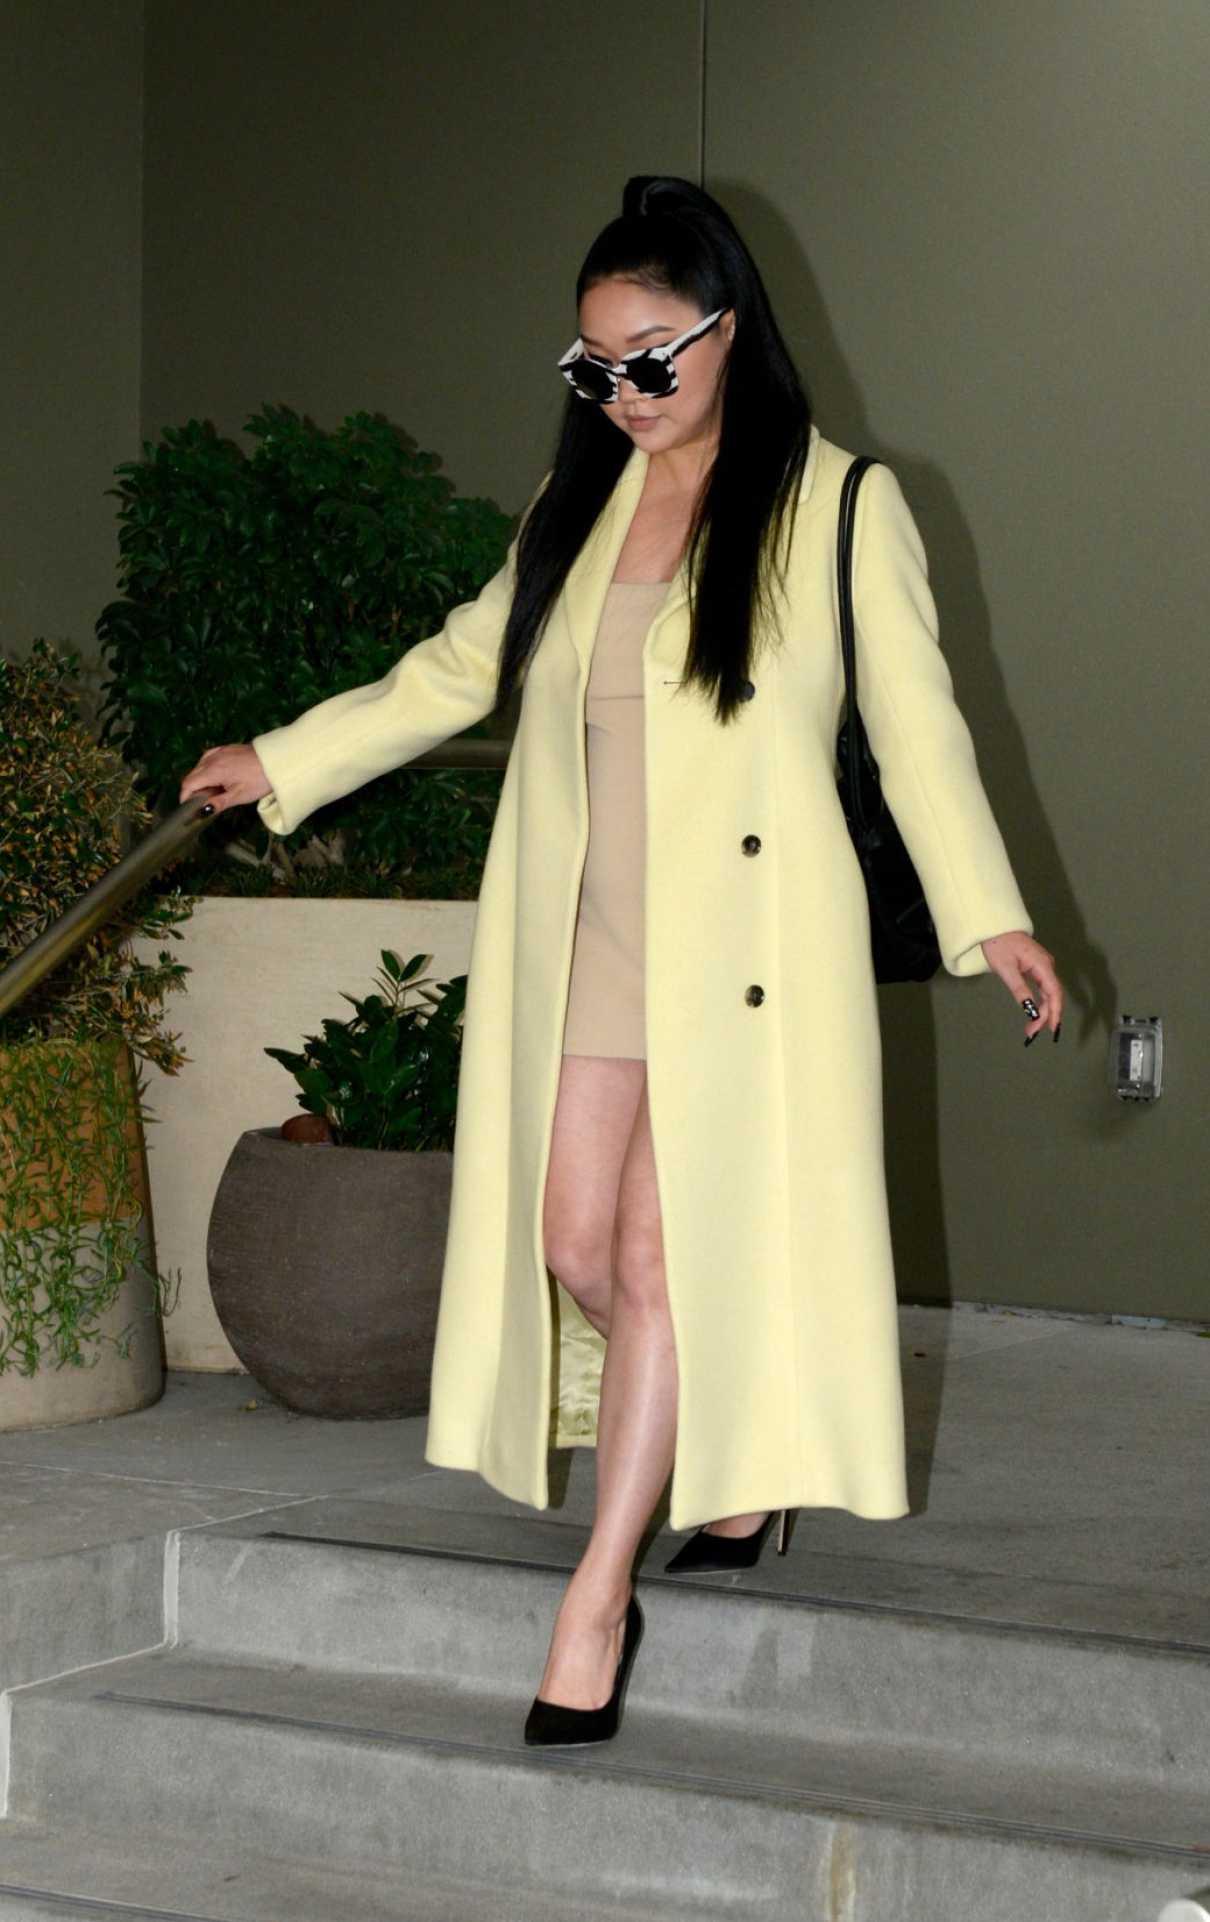 Lana Condor in a Yellow Coat